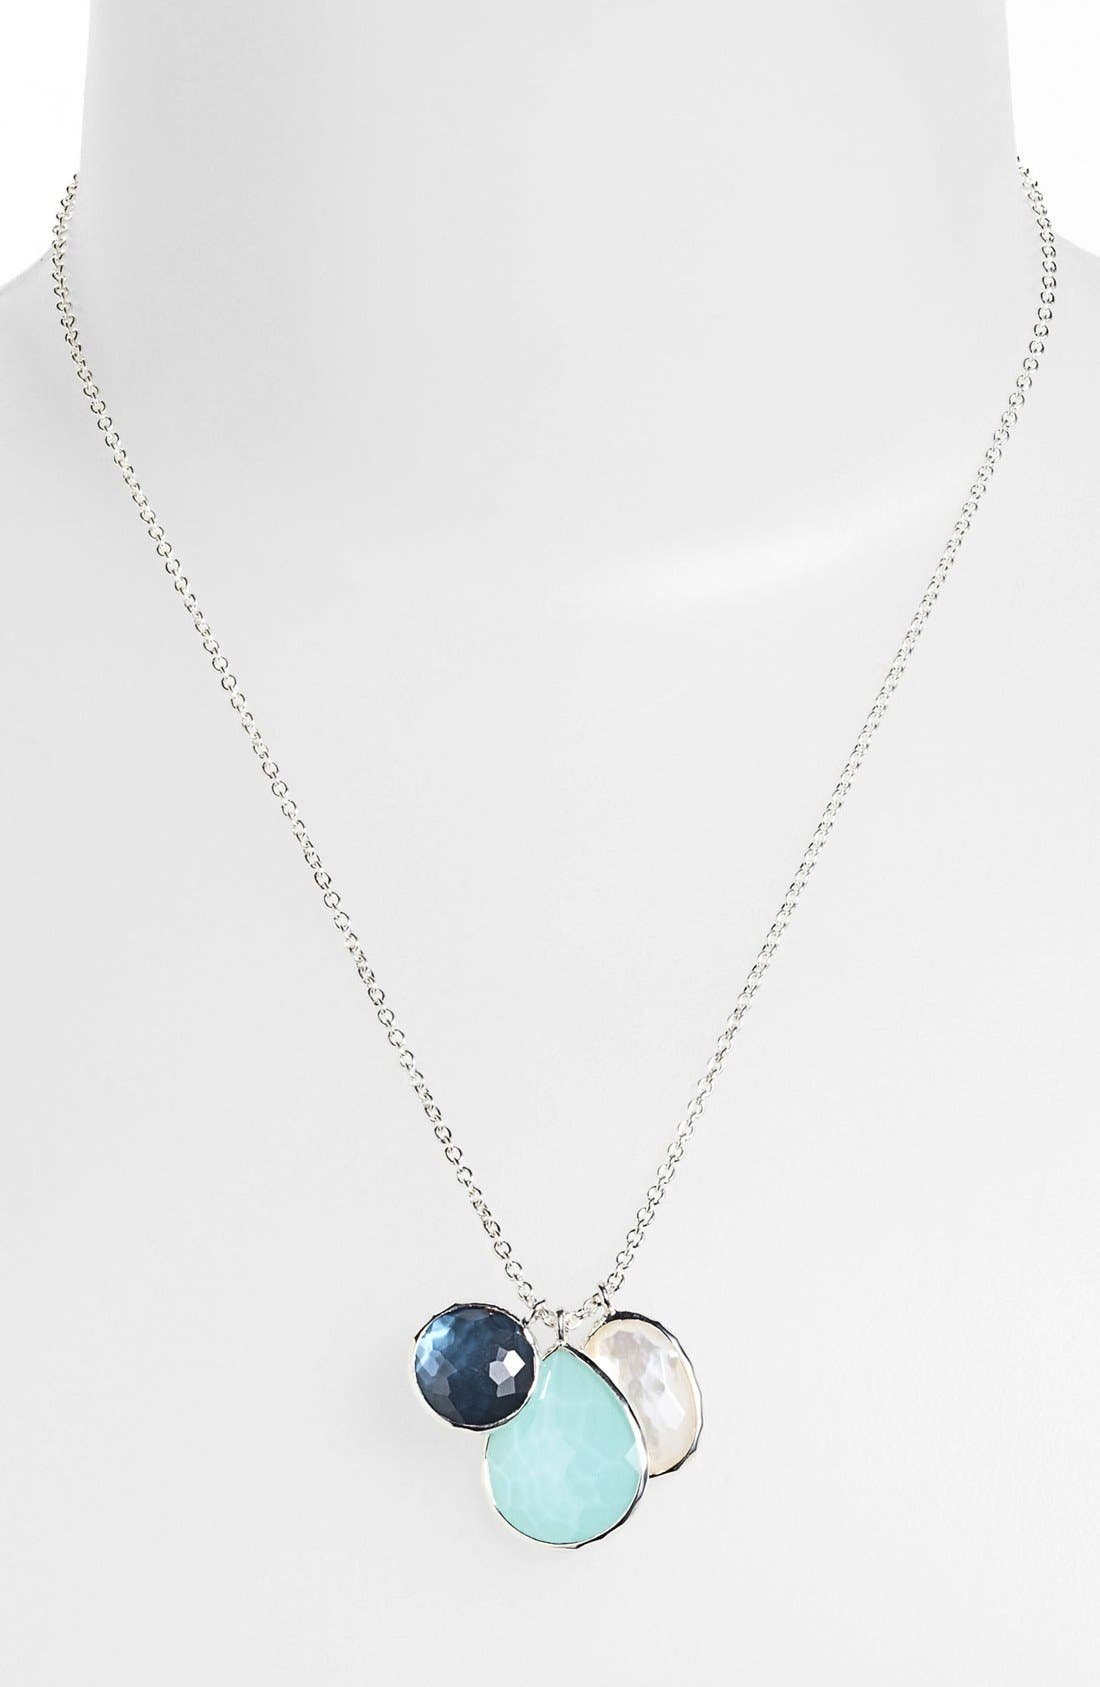 Main Image - Ippolita 'Wonderland' Triple Charm Necklace